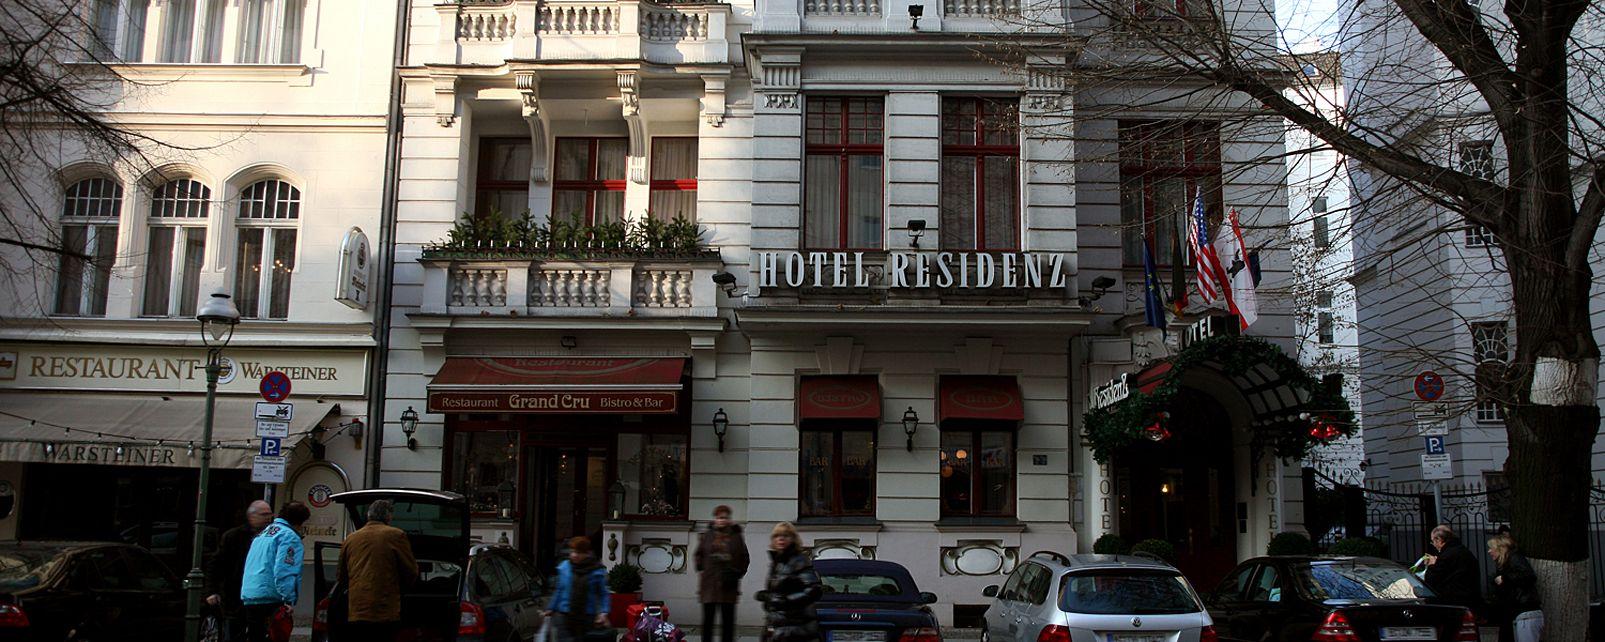 Hotel Golden Tulip Residenz